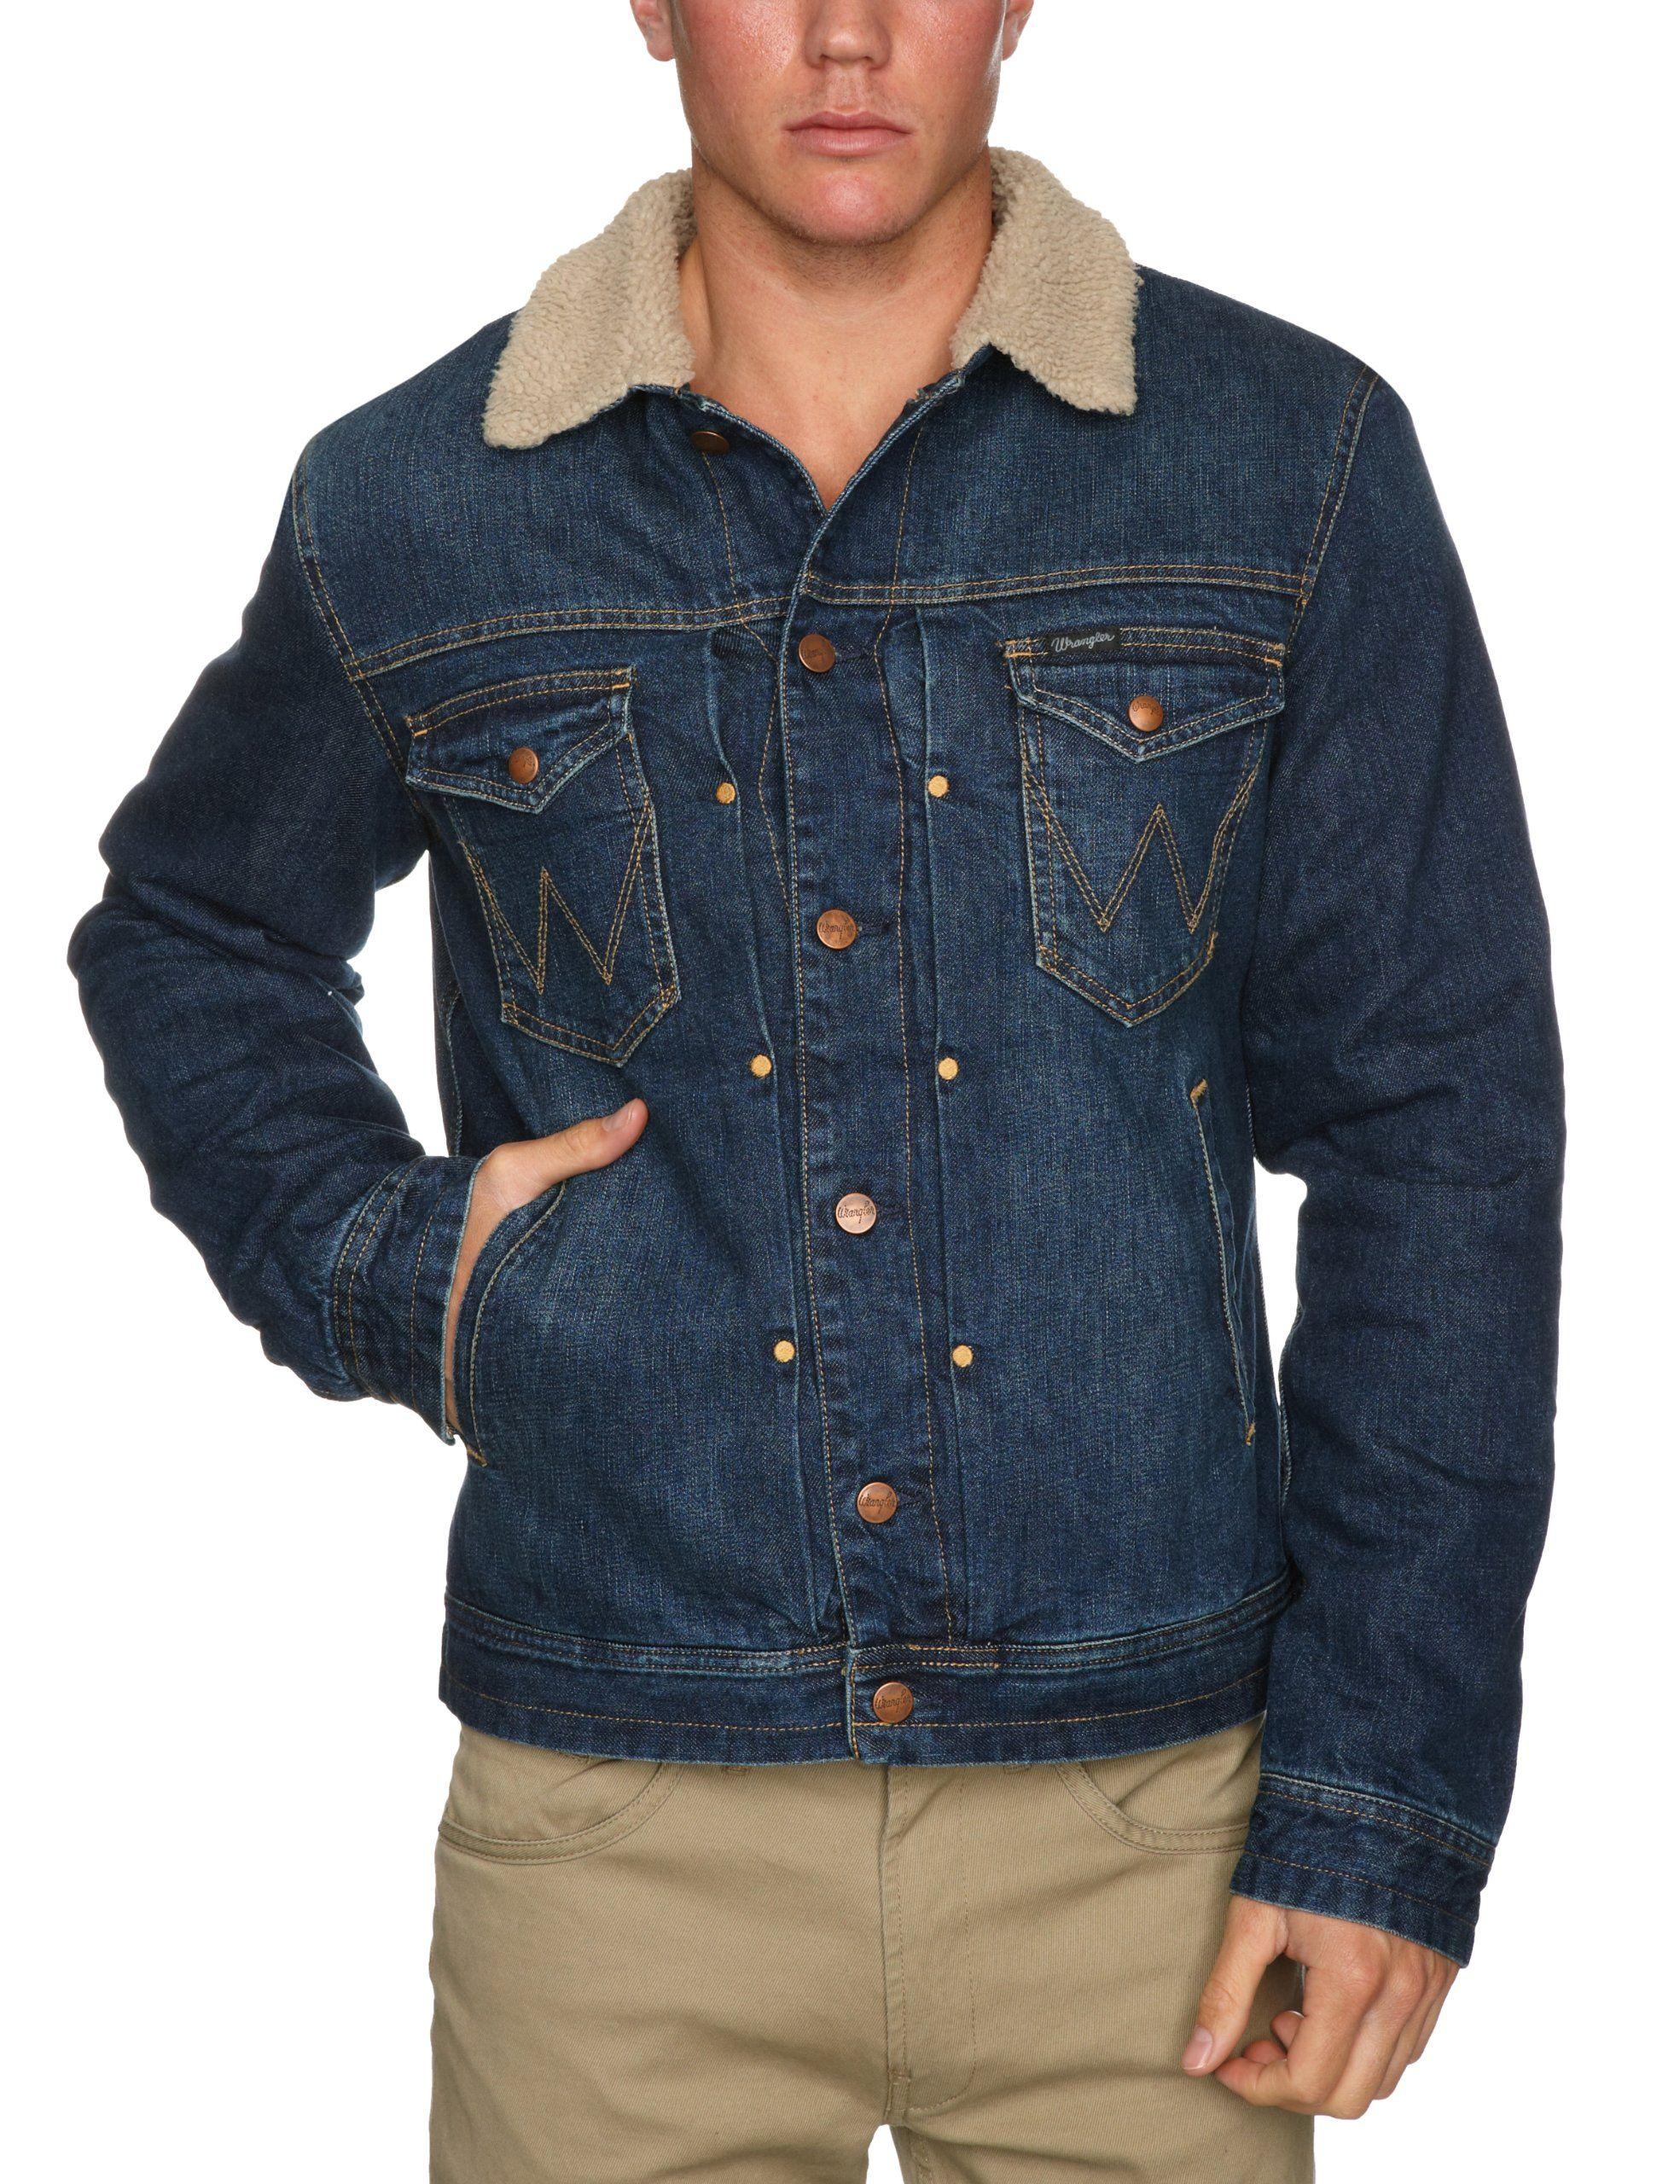 Wrangler Men S Sherpa Denim Long Sleeve Jacket Amazon Co Uk Clothing Carhartt Mens Jacket Carhartt Jacket Mens Sherpa Jacket [ 2560 x 1969 Pixel ]